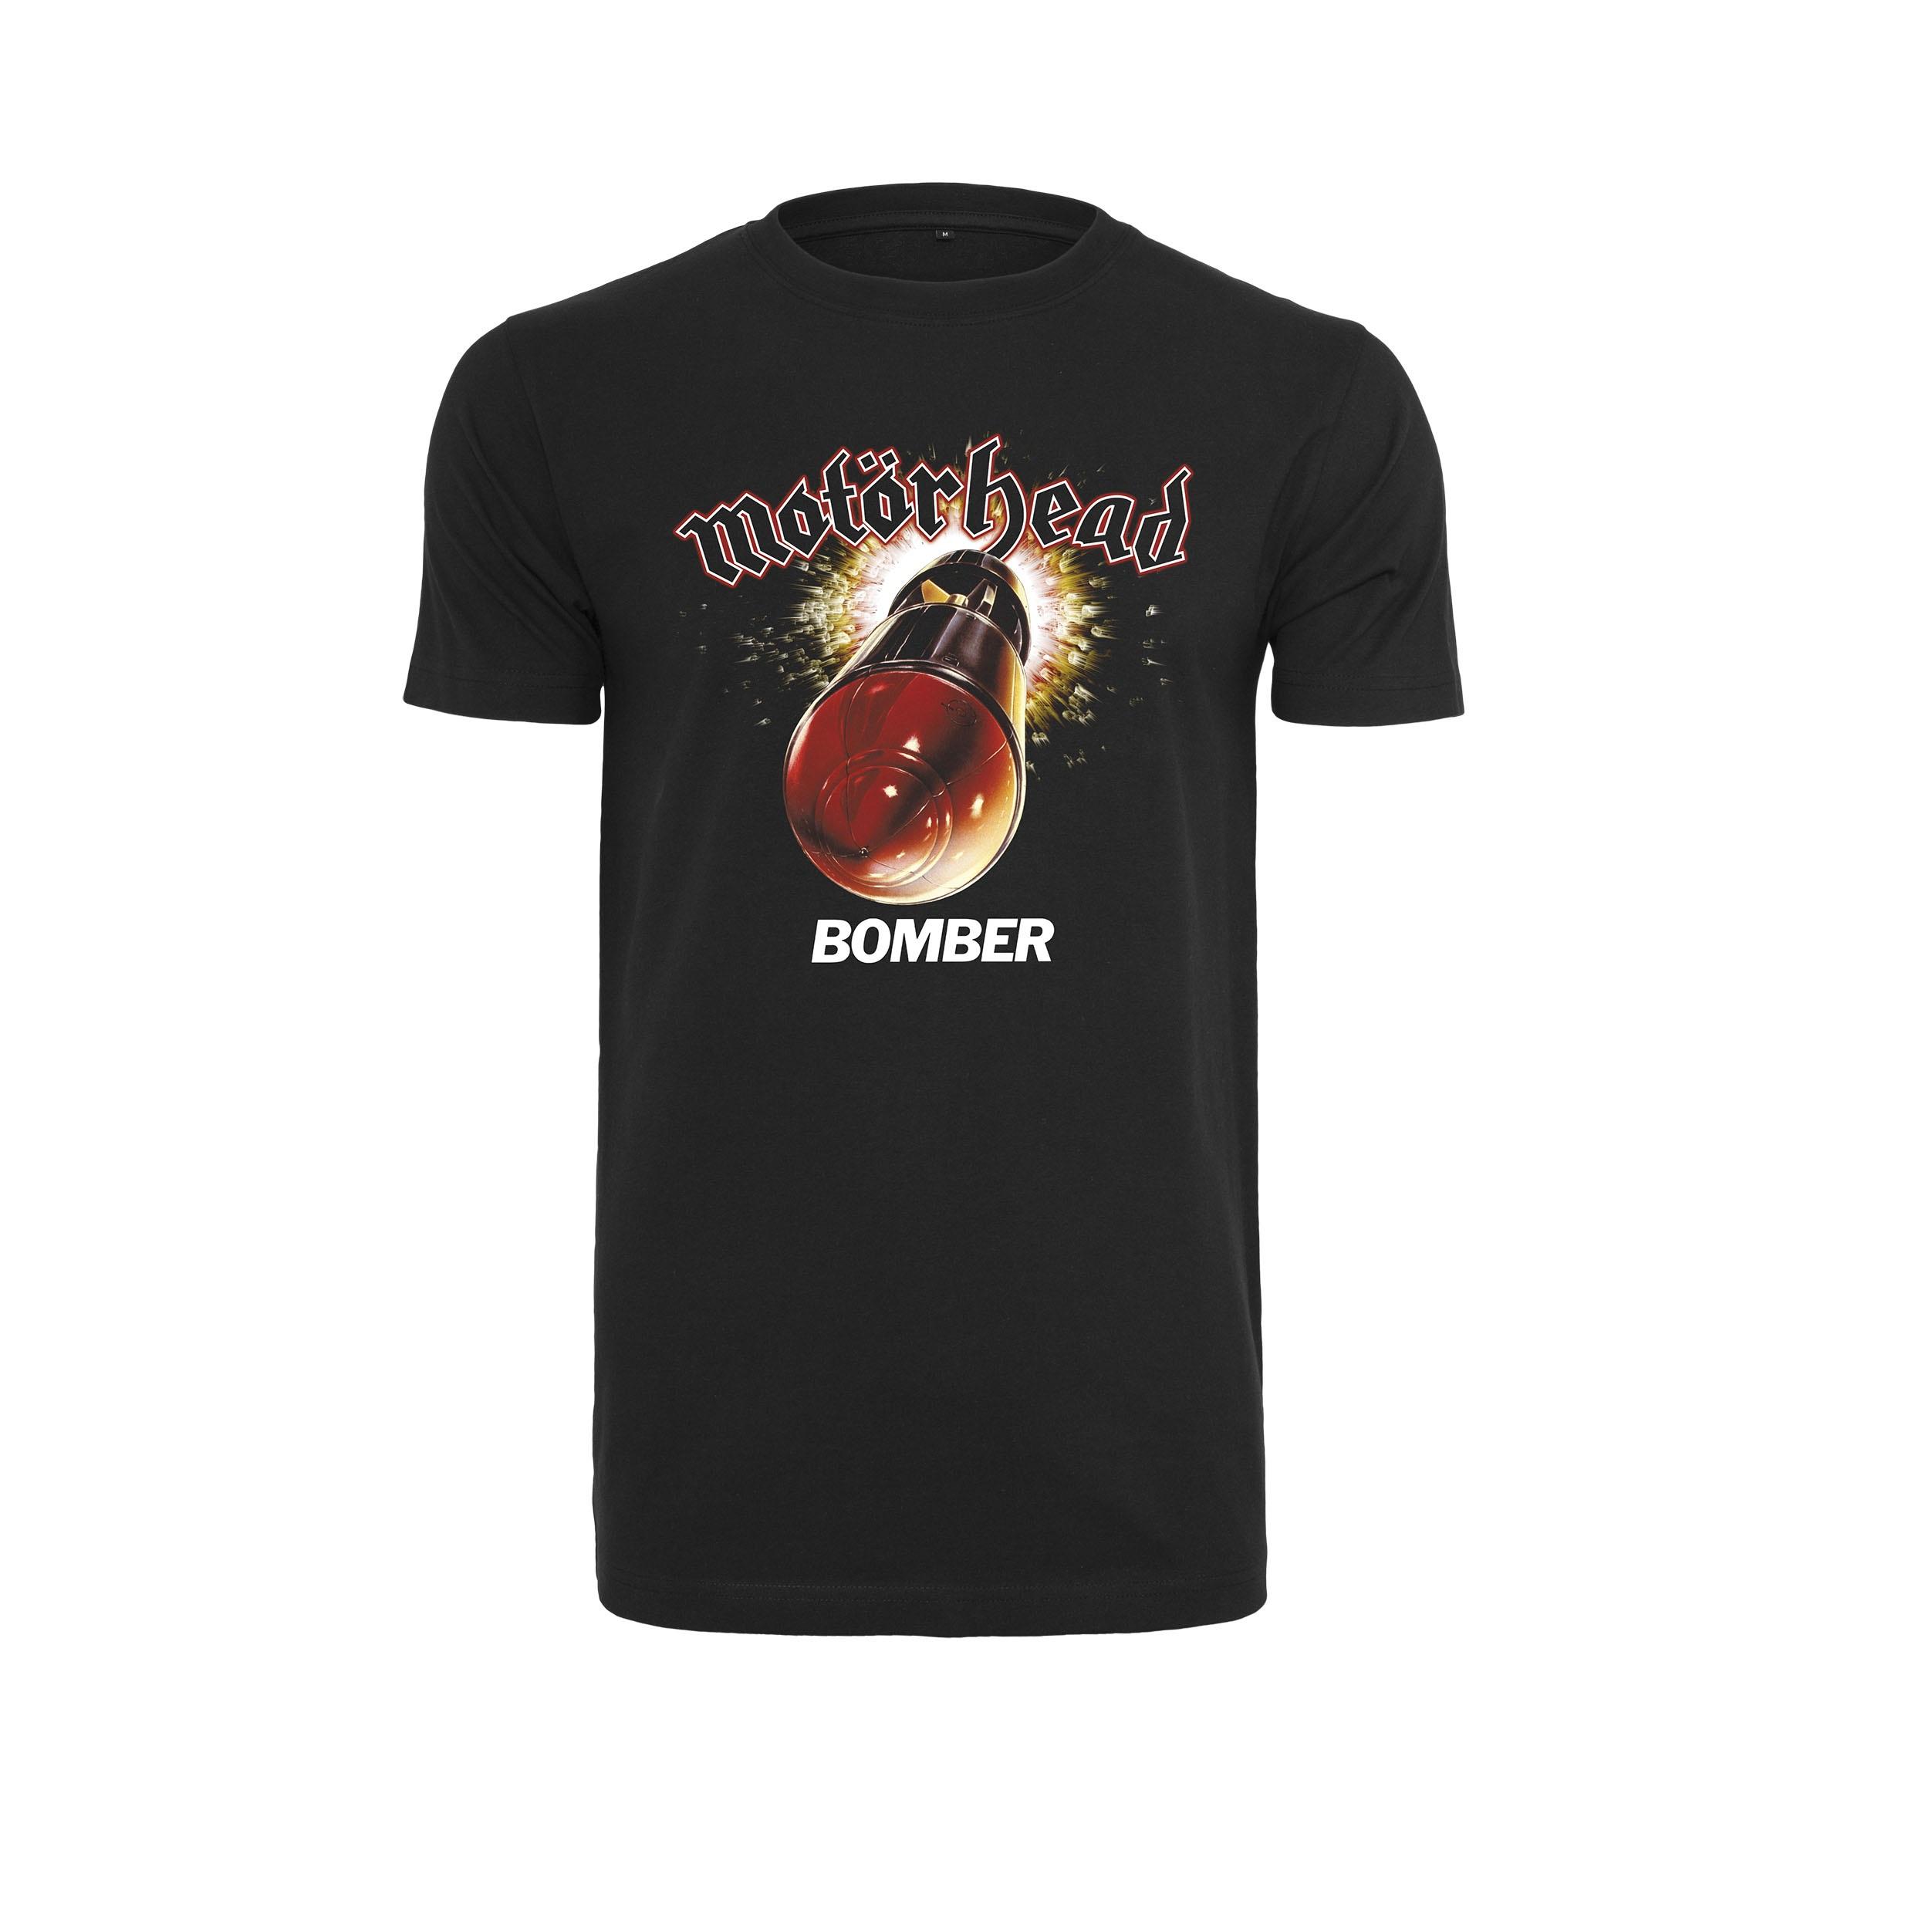 Motörhead - Tričko Bomber Tee - Muž, Čierna, XS